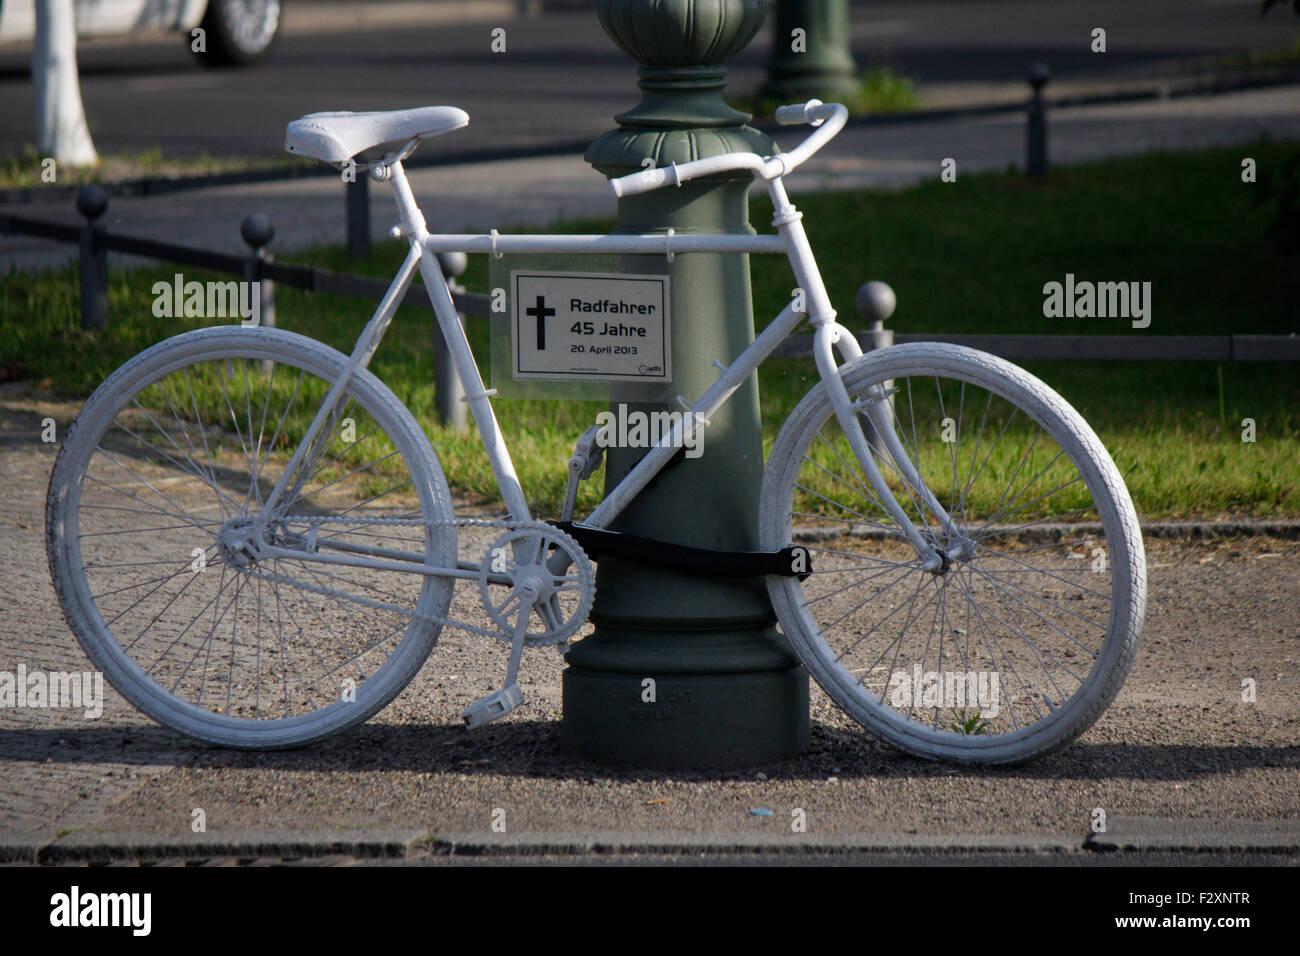 ein weisses Fahrrad als Mahnmal an dem Ort, an dem ein Fahrradfahrer durch einen Verkehrsunfall gestorben ist, Berlin. Stock Photo